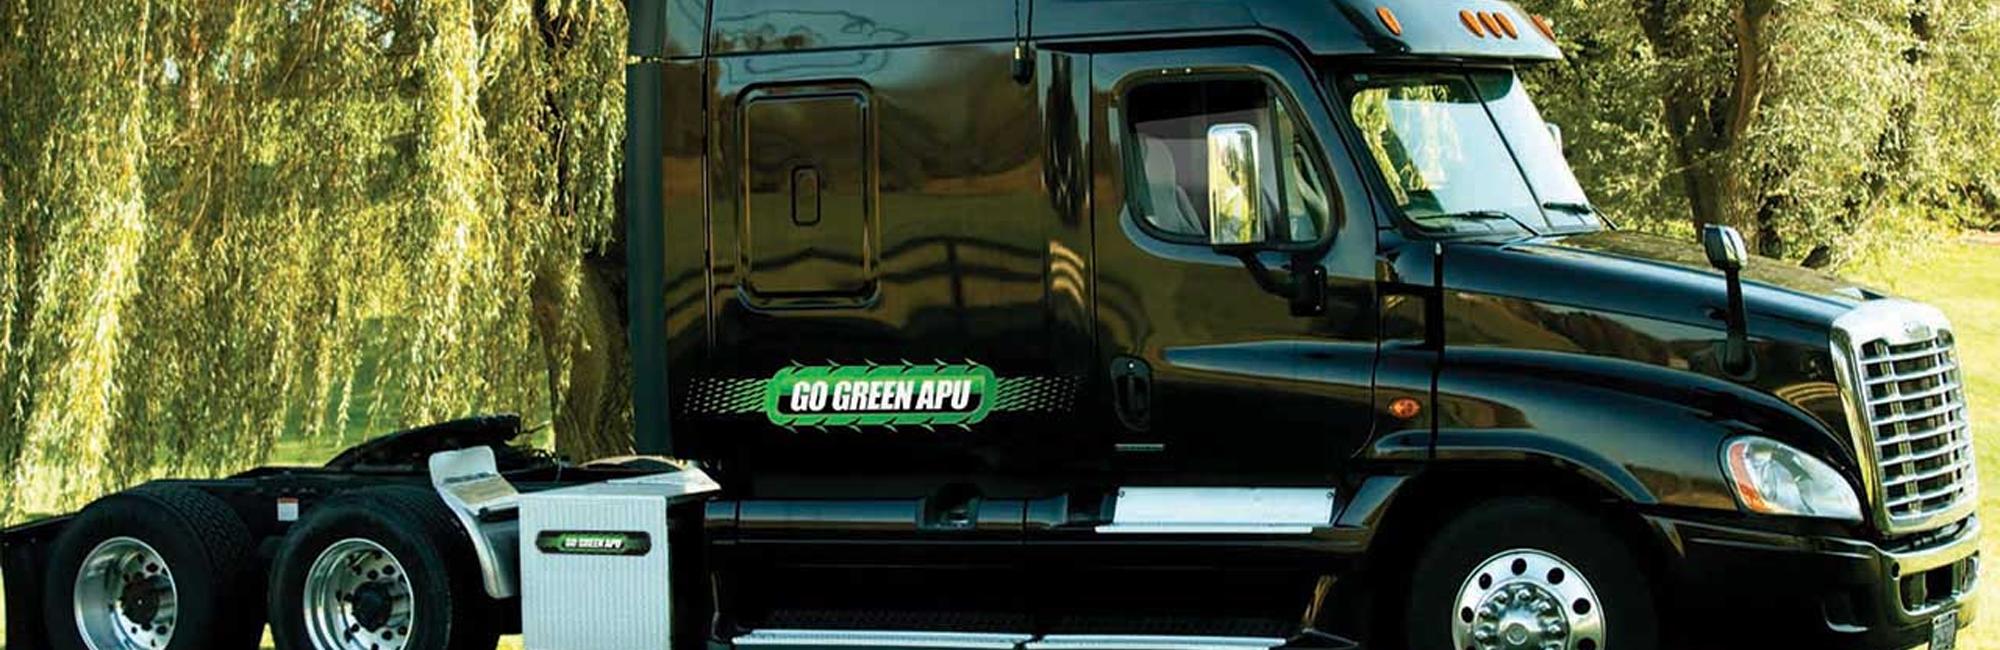 Go-Green-APU-Truck